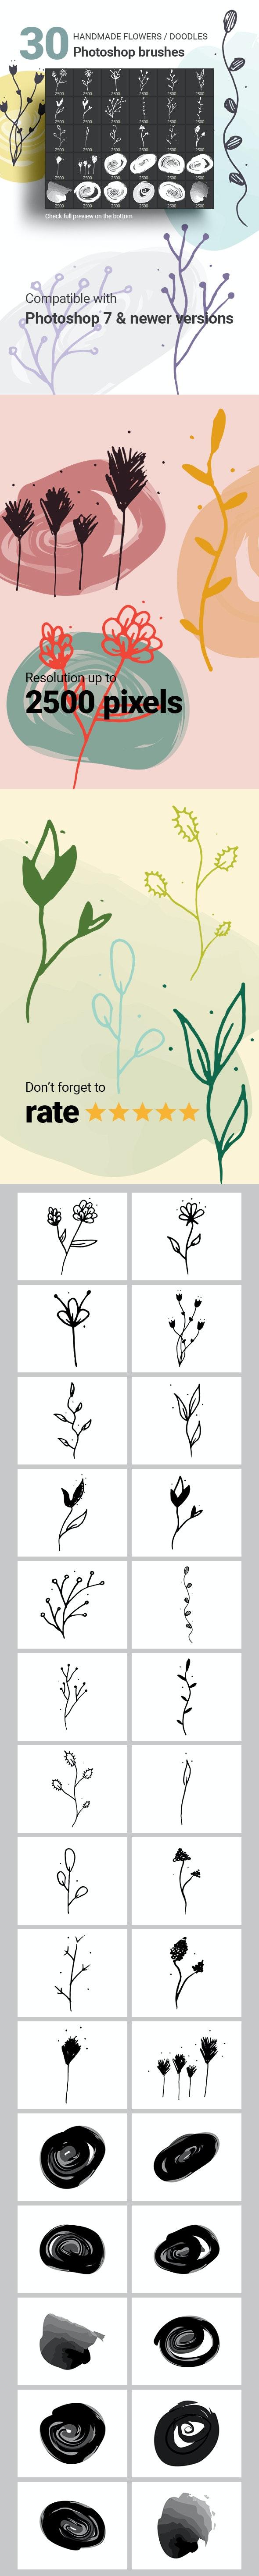 30 Hand-drawn Flowers Vector Doodles Photoshop Brushes - Brushes Photoshop